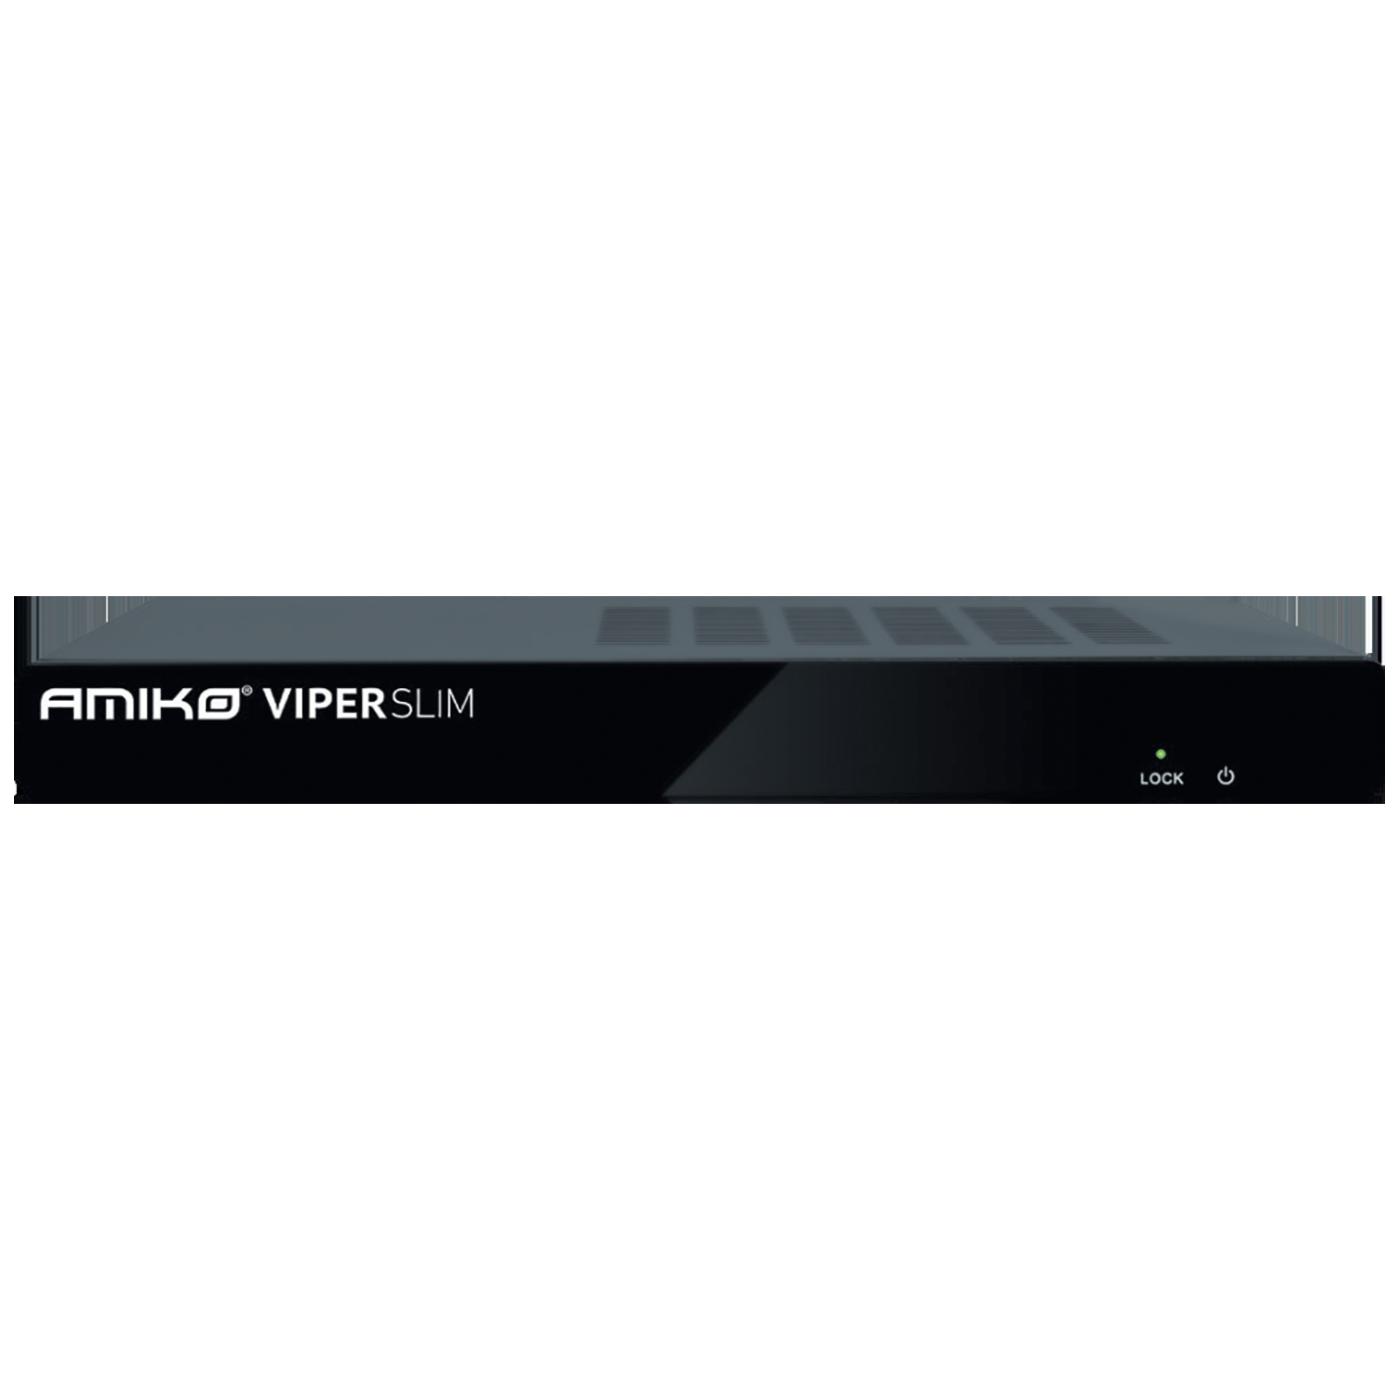 Viper Slim